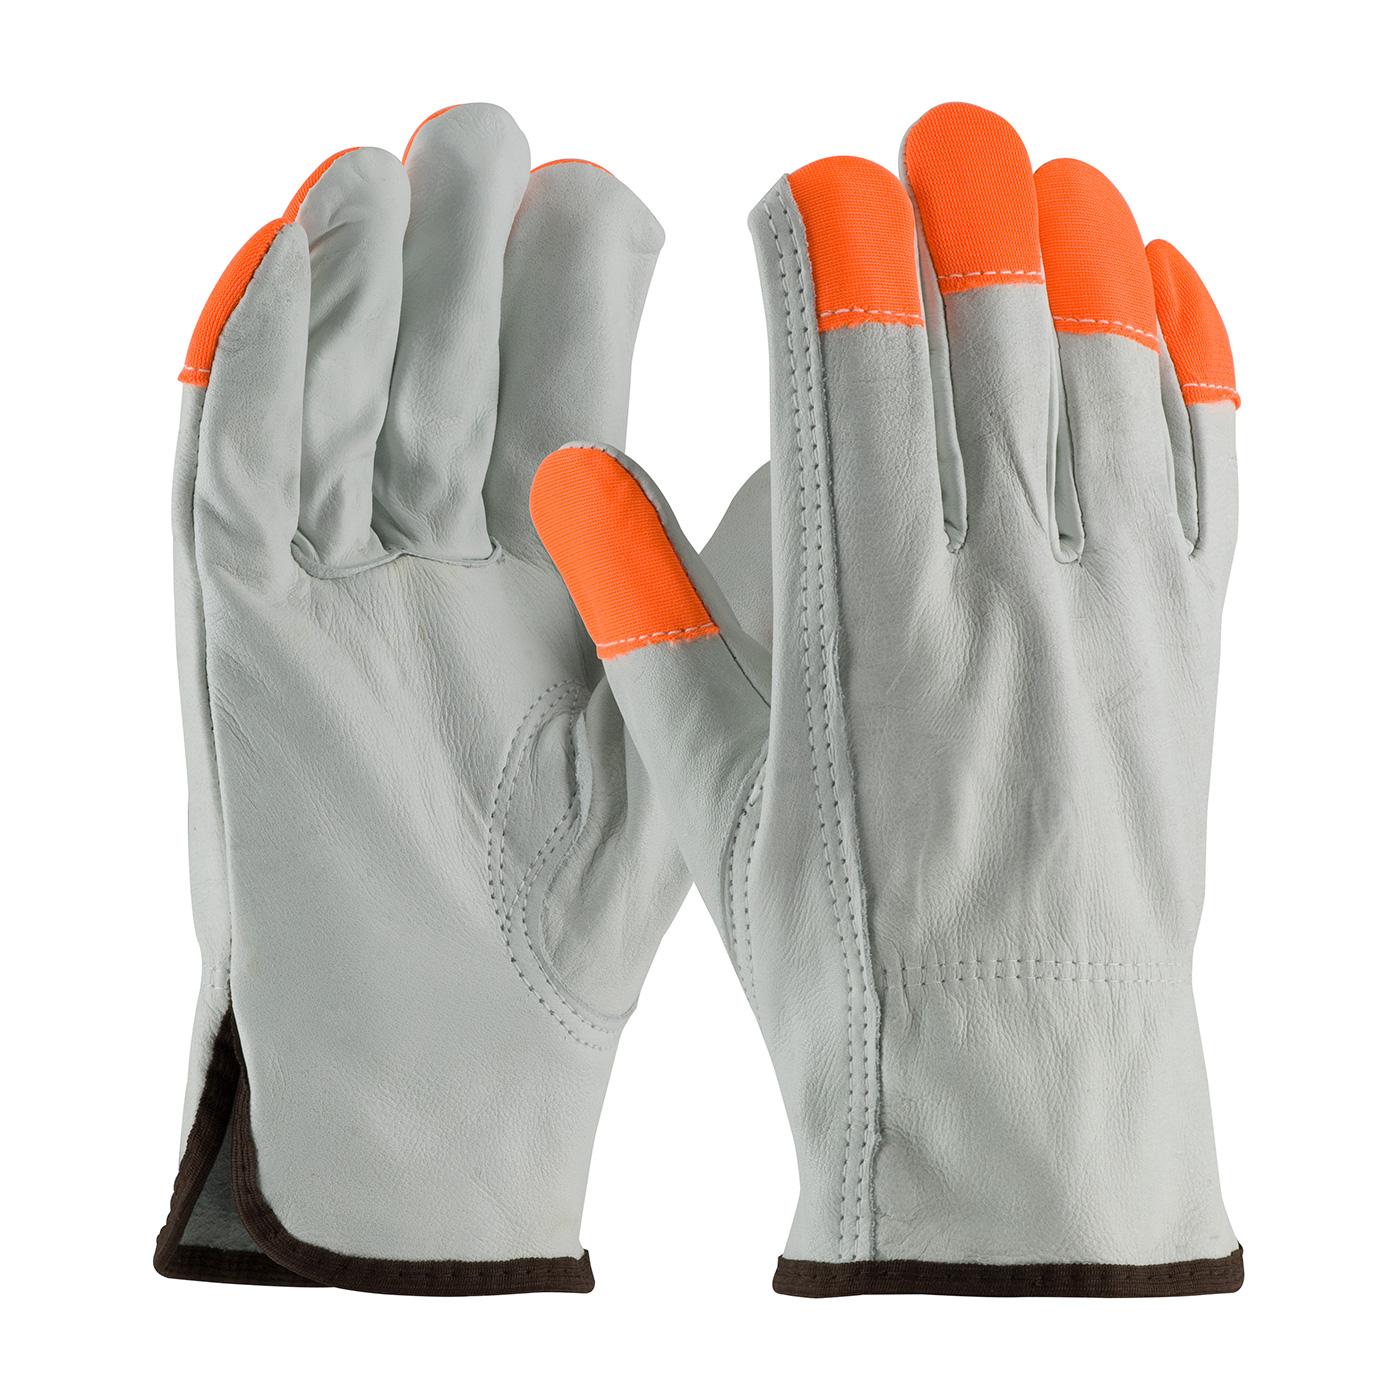 Regular Grade Top Grain Cowhide Leather Drivers Glove with Hi-Vis Fingertips - Keystone Thumb, Natural, S